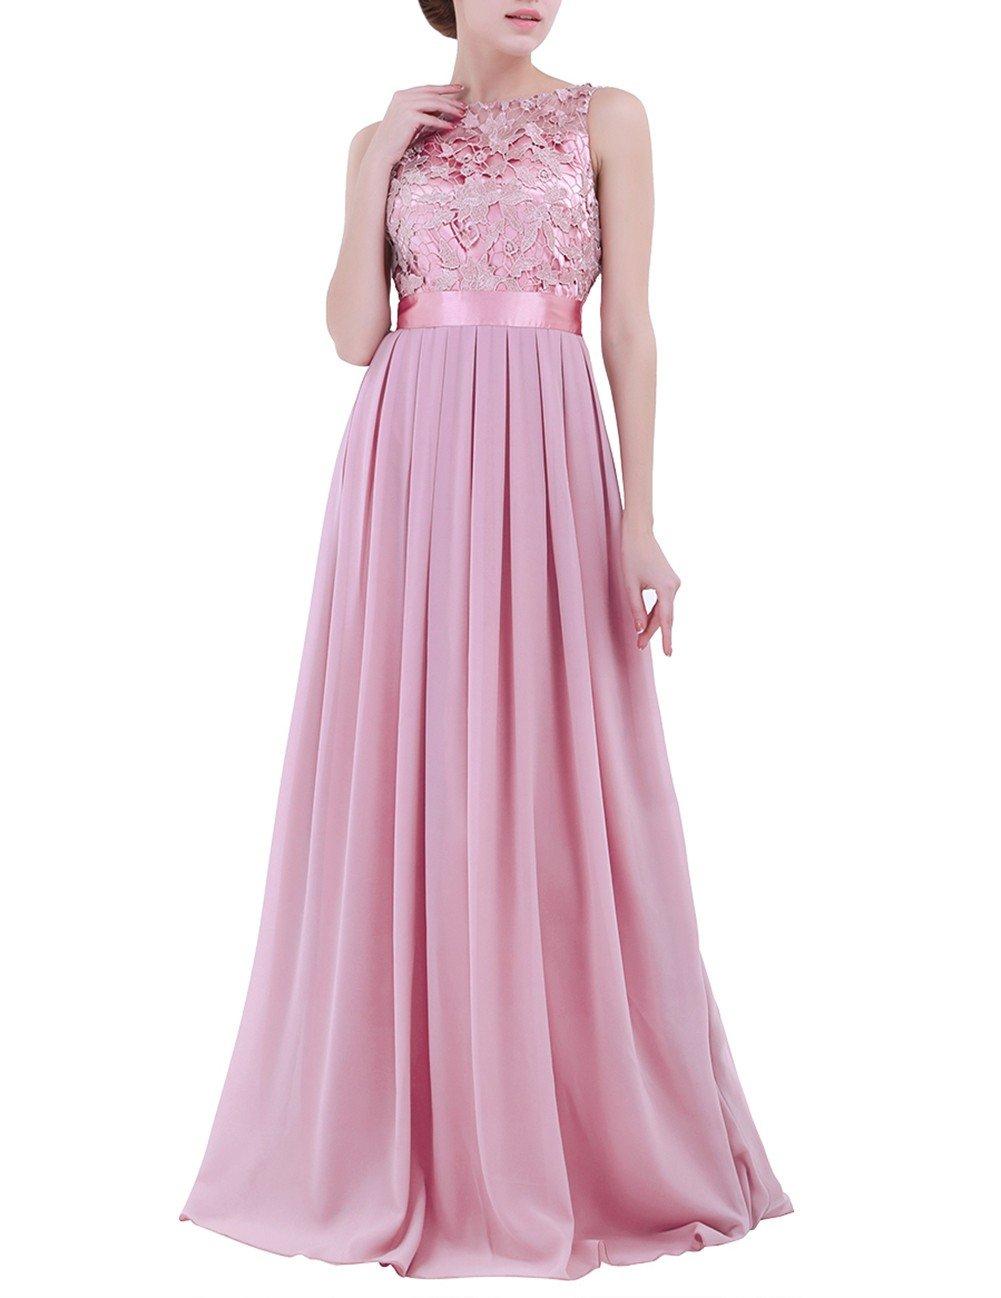 Plum Bridesmaid Dresses: Amazon.co.uk